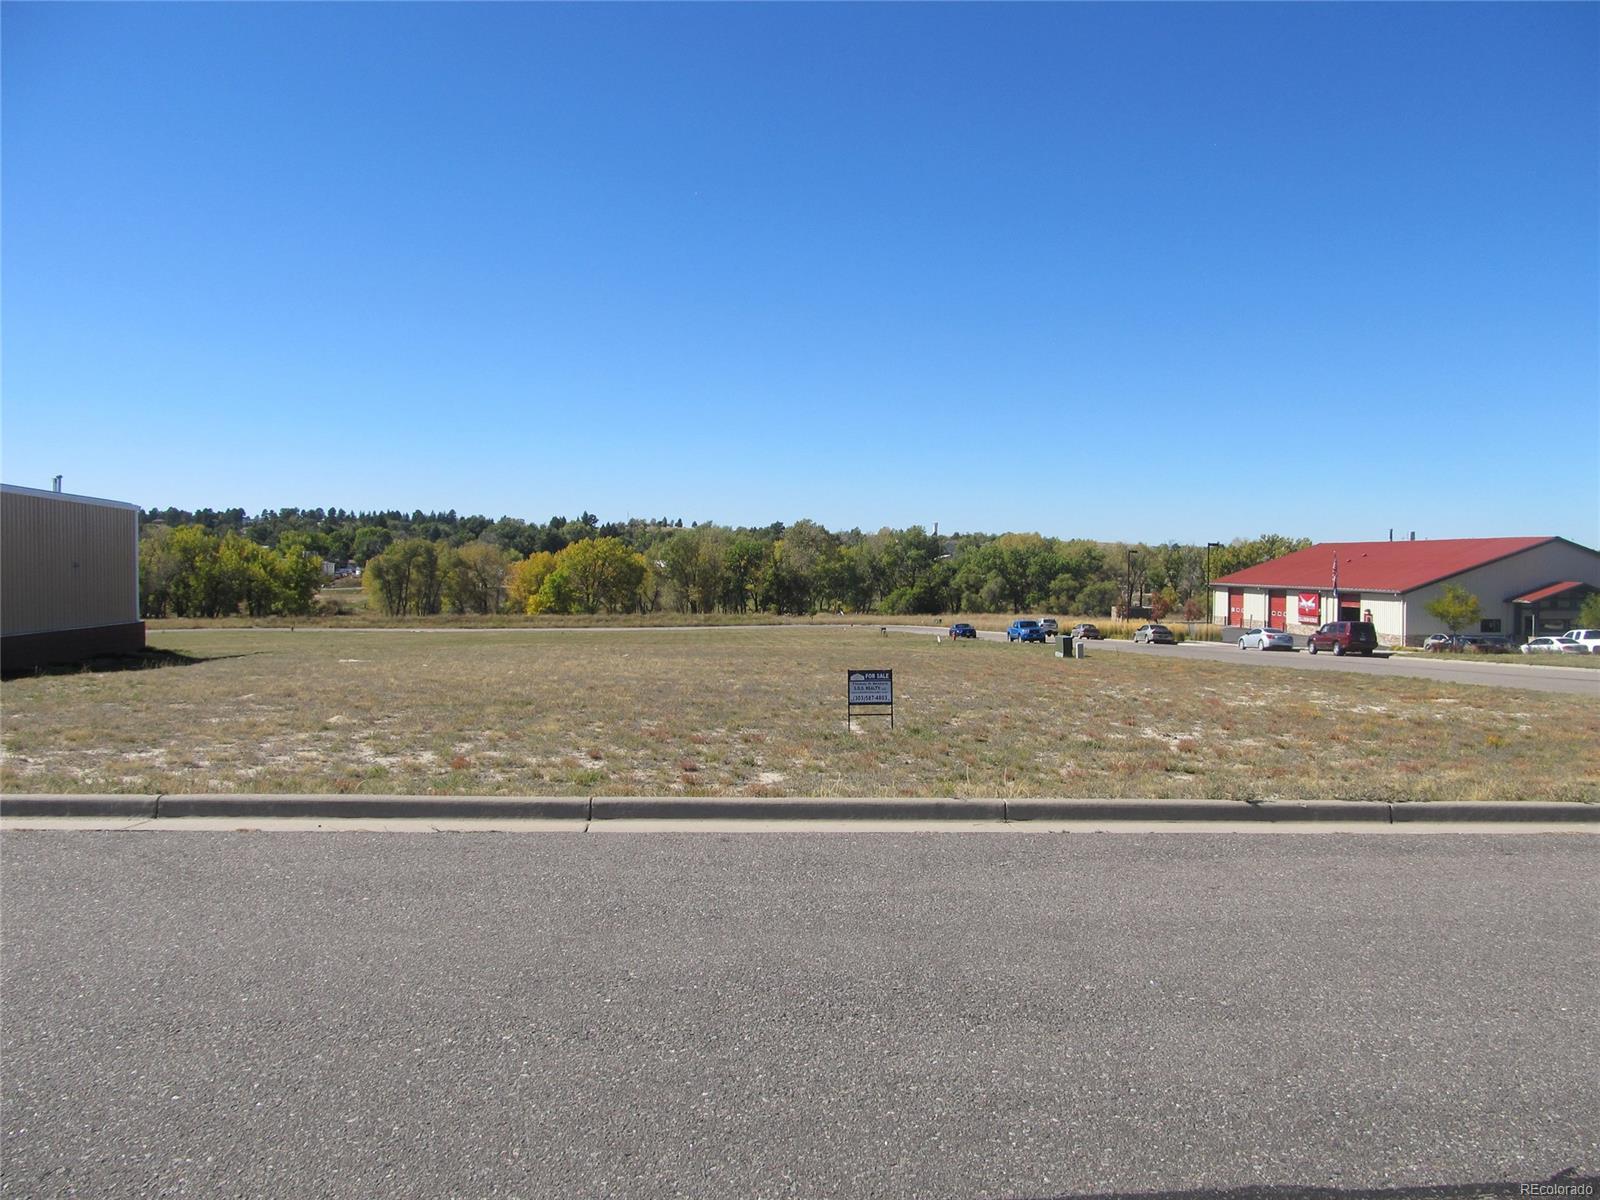 760 Crossroad Circle, Elizabeth, CO 80107 - Elizabeth, CO real estate listing